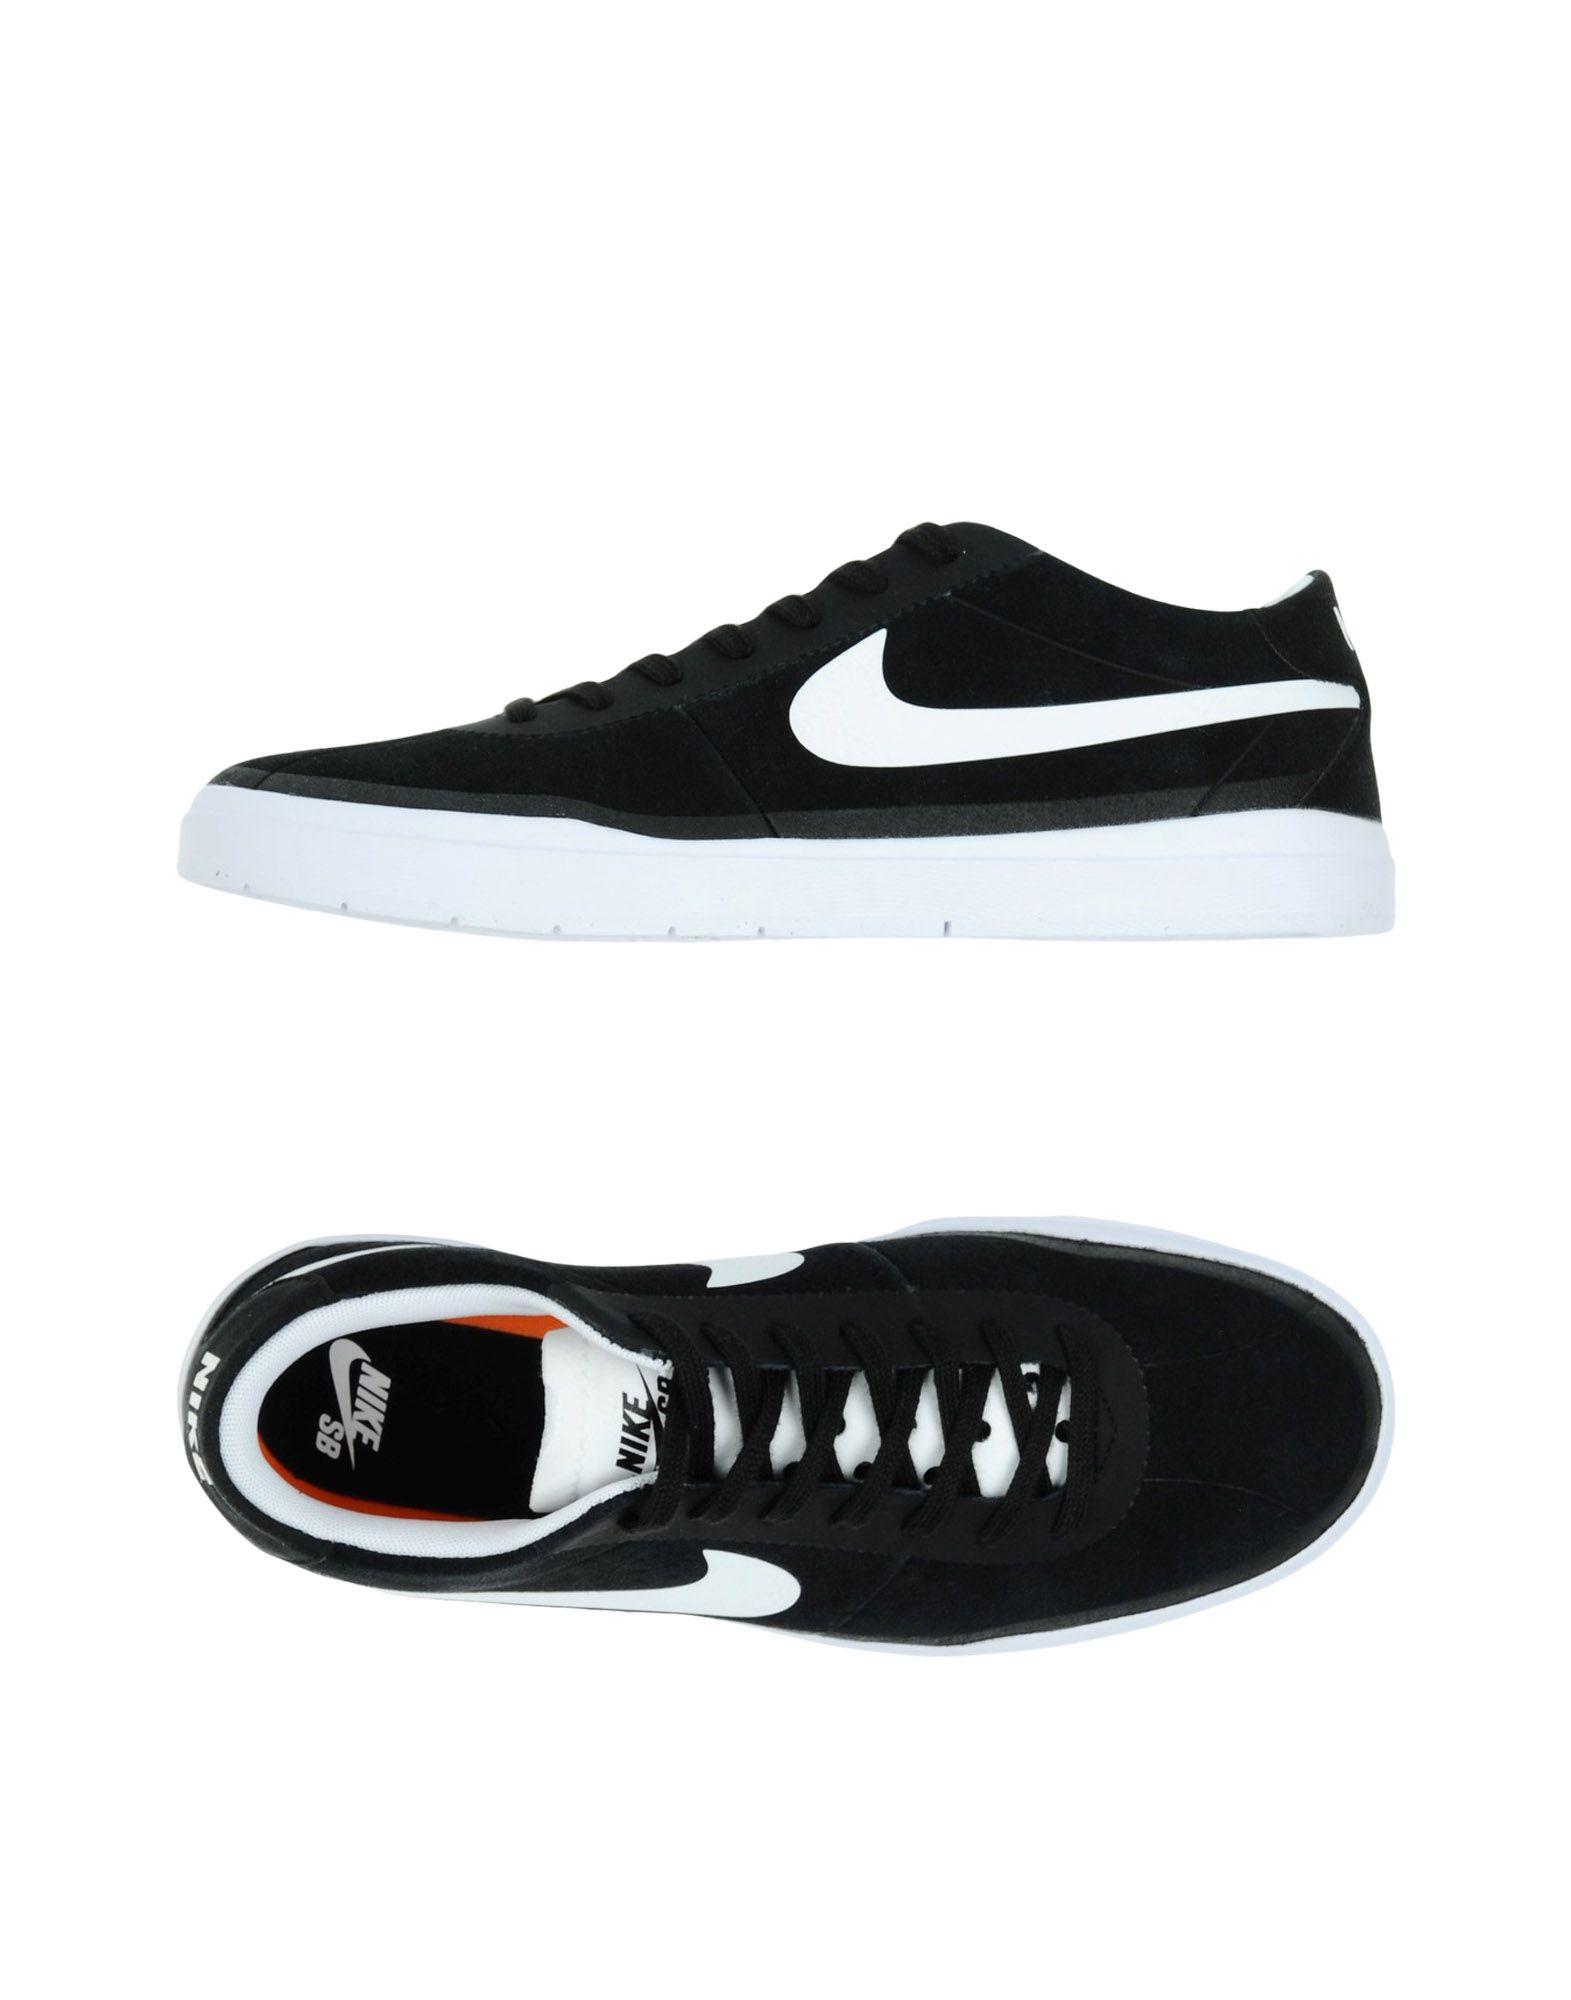 NIKE SB COLLECTION Низкие кеды и кроссовки кеды кроссовки высокие nike sb zoom dunk high pro black